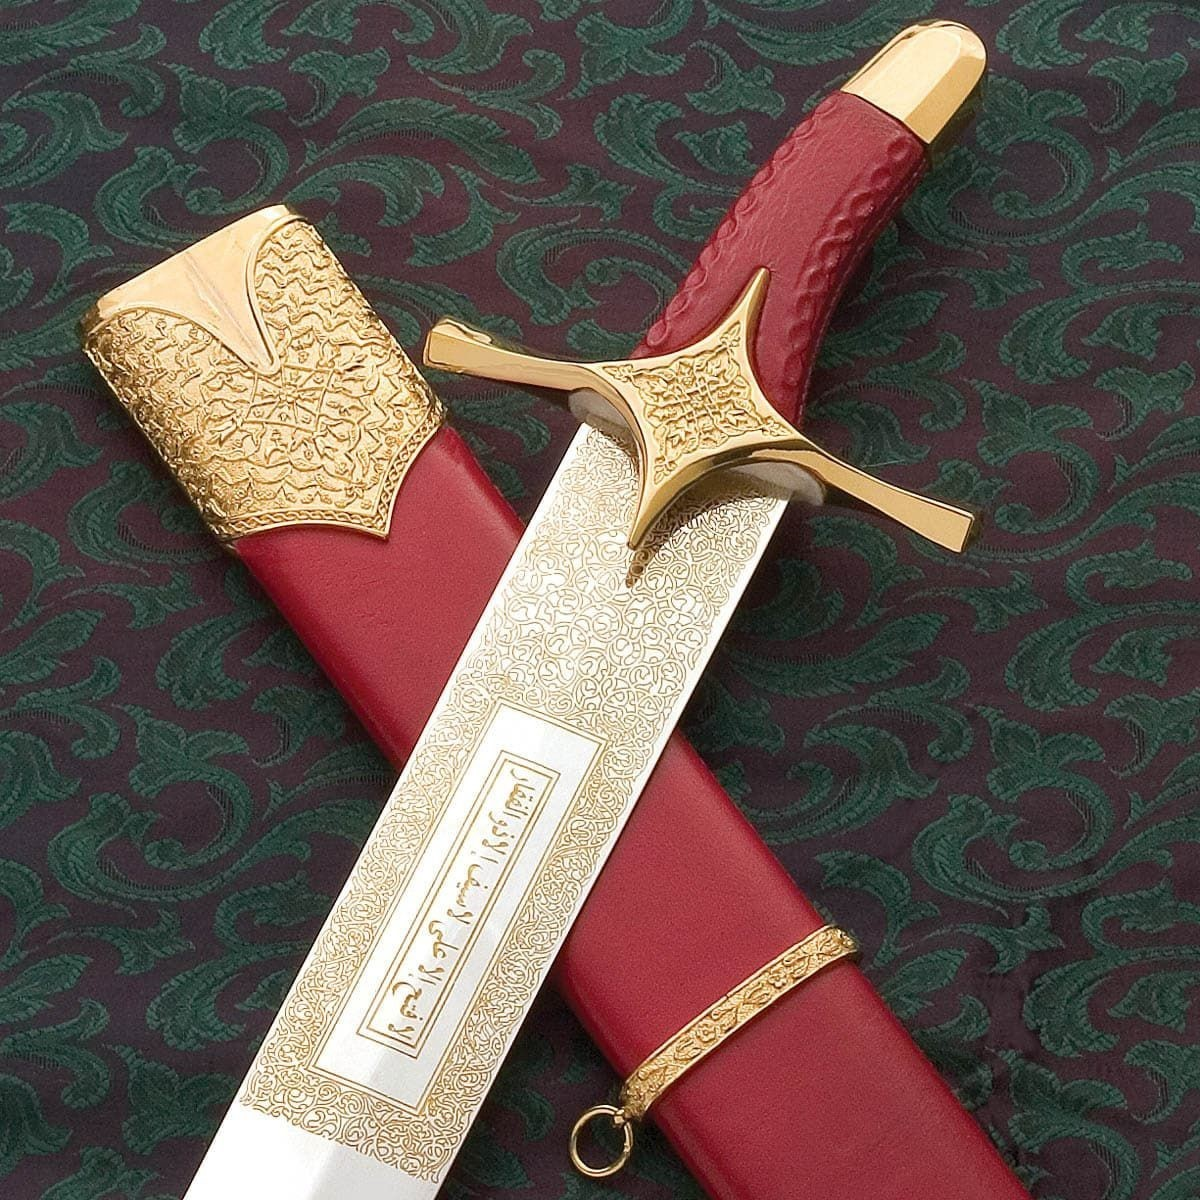 Hilt and Scabbard of Sword of 'Ali ibn Abu Talib by Windlass Steelcrafts